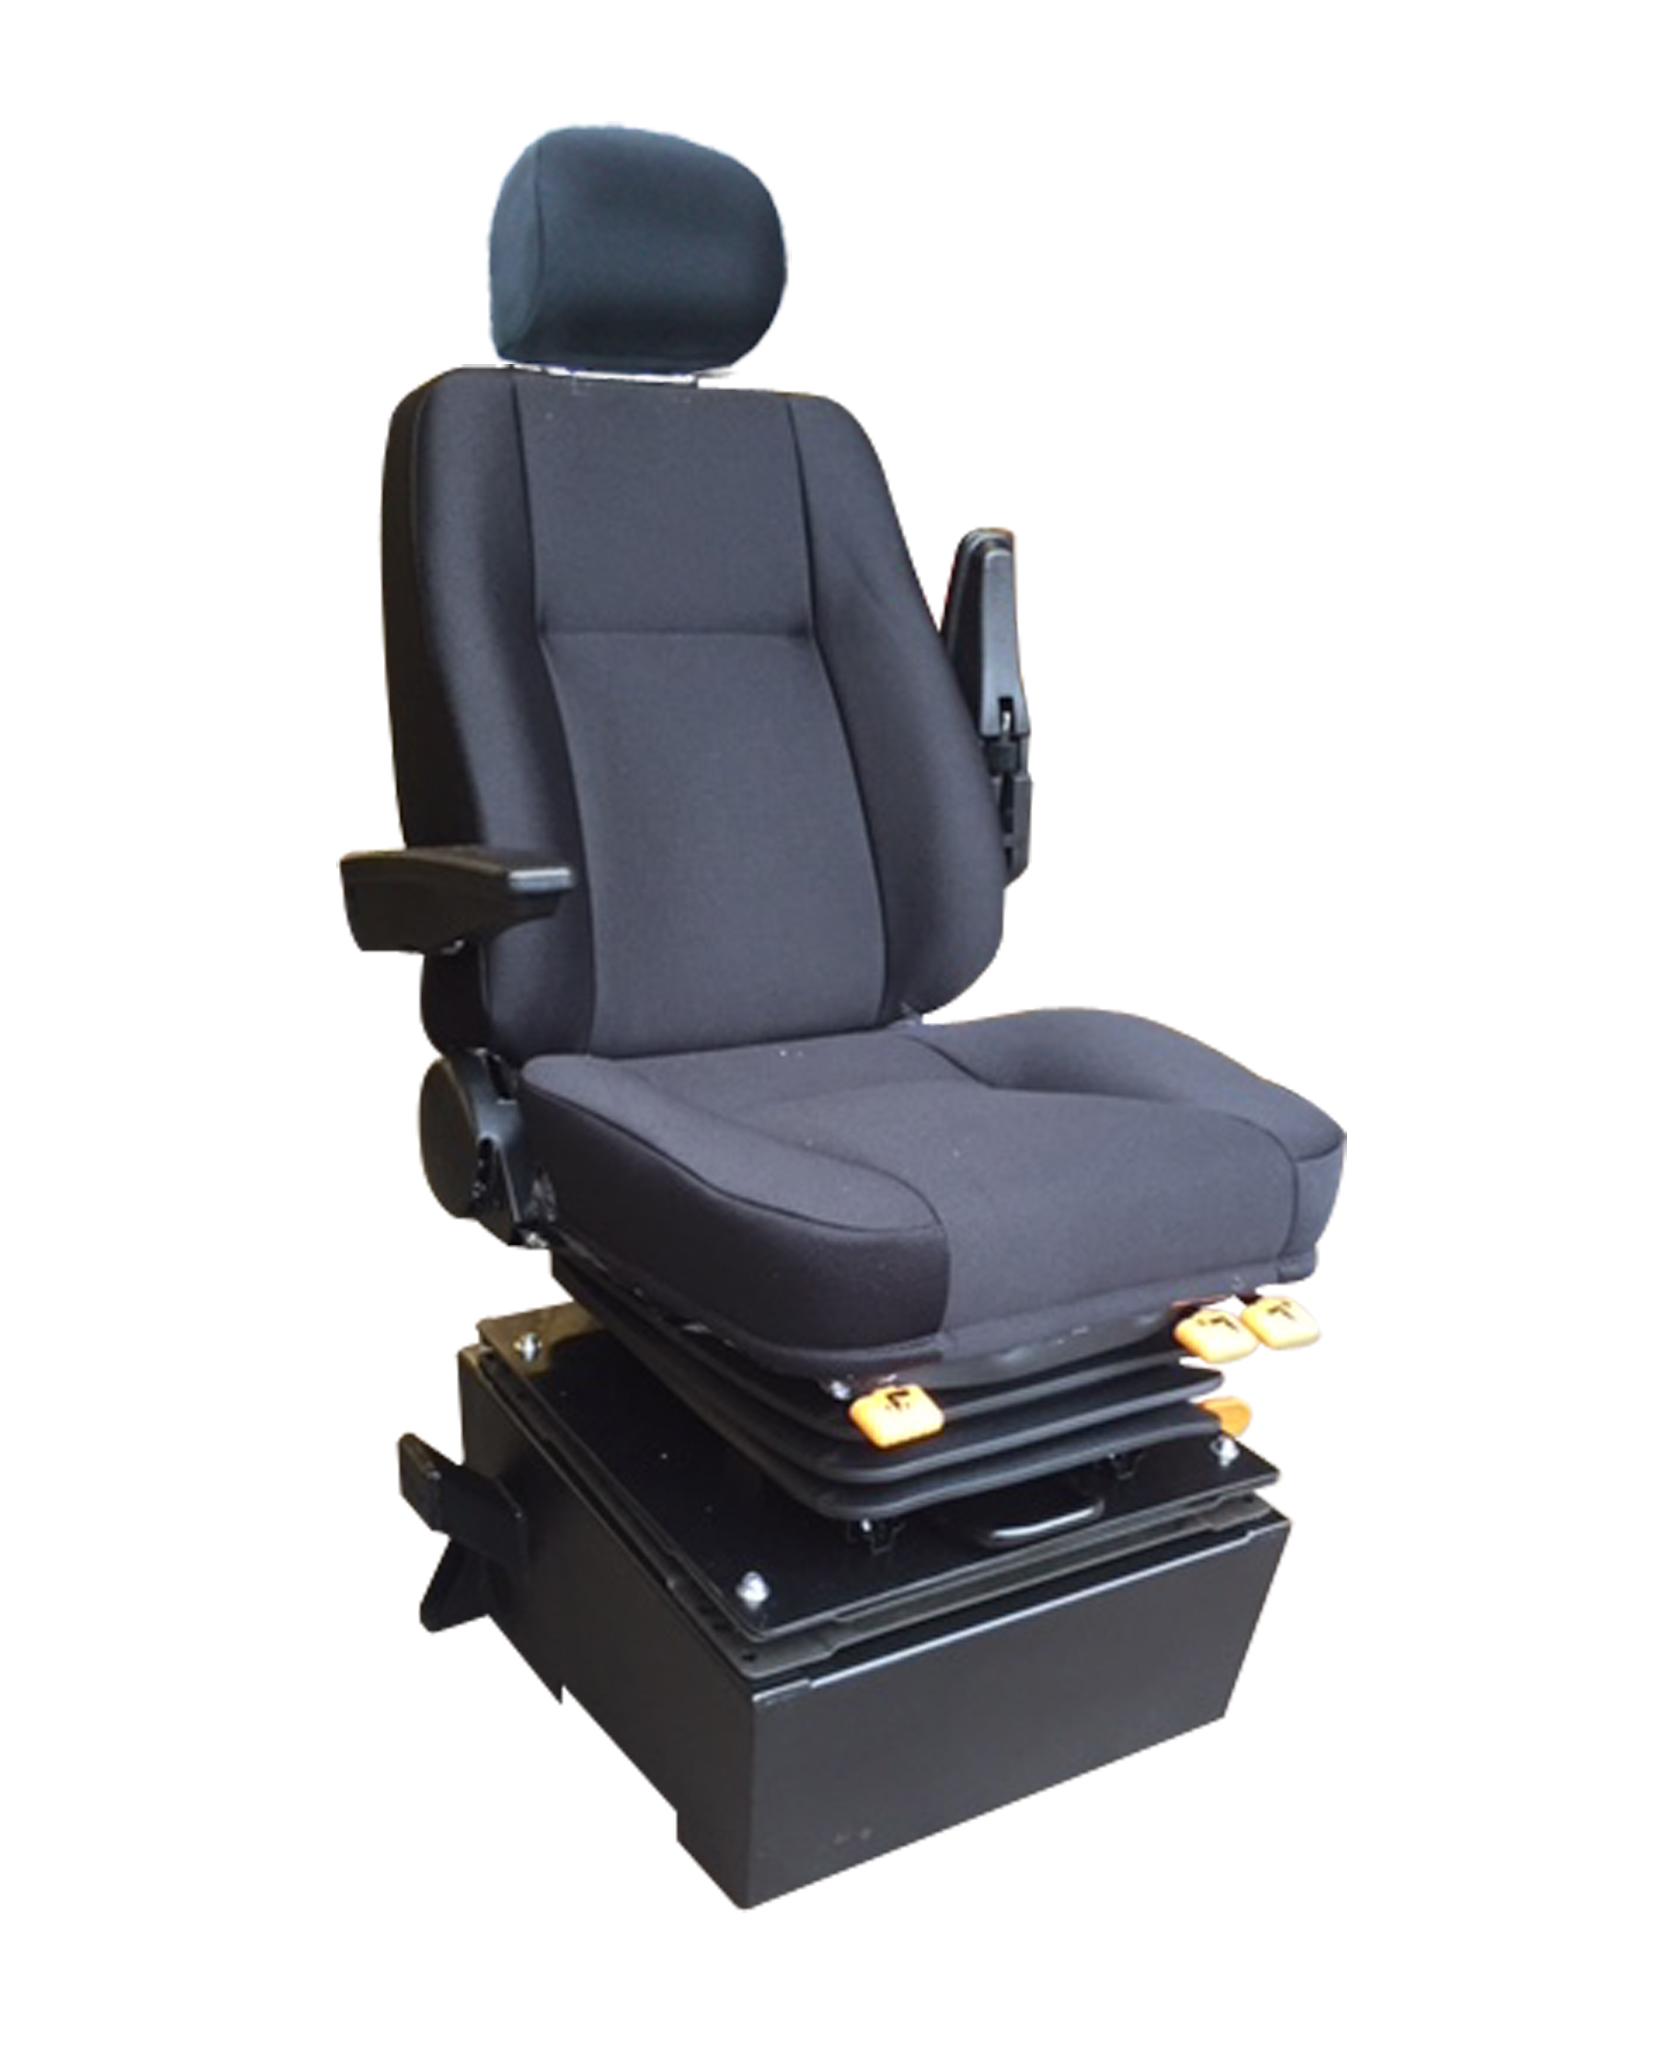 sprinter van single passenger seat)